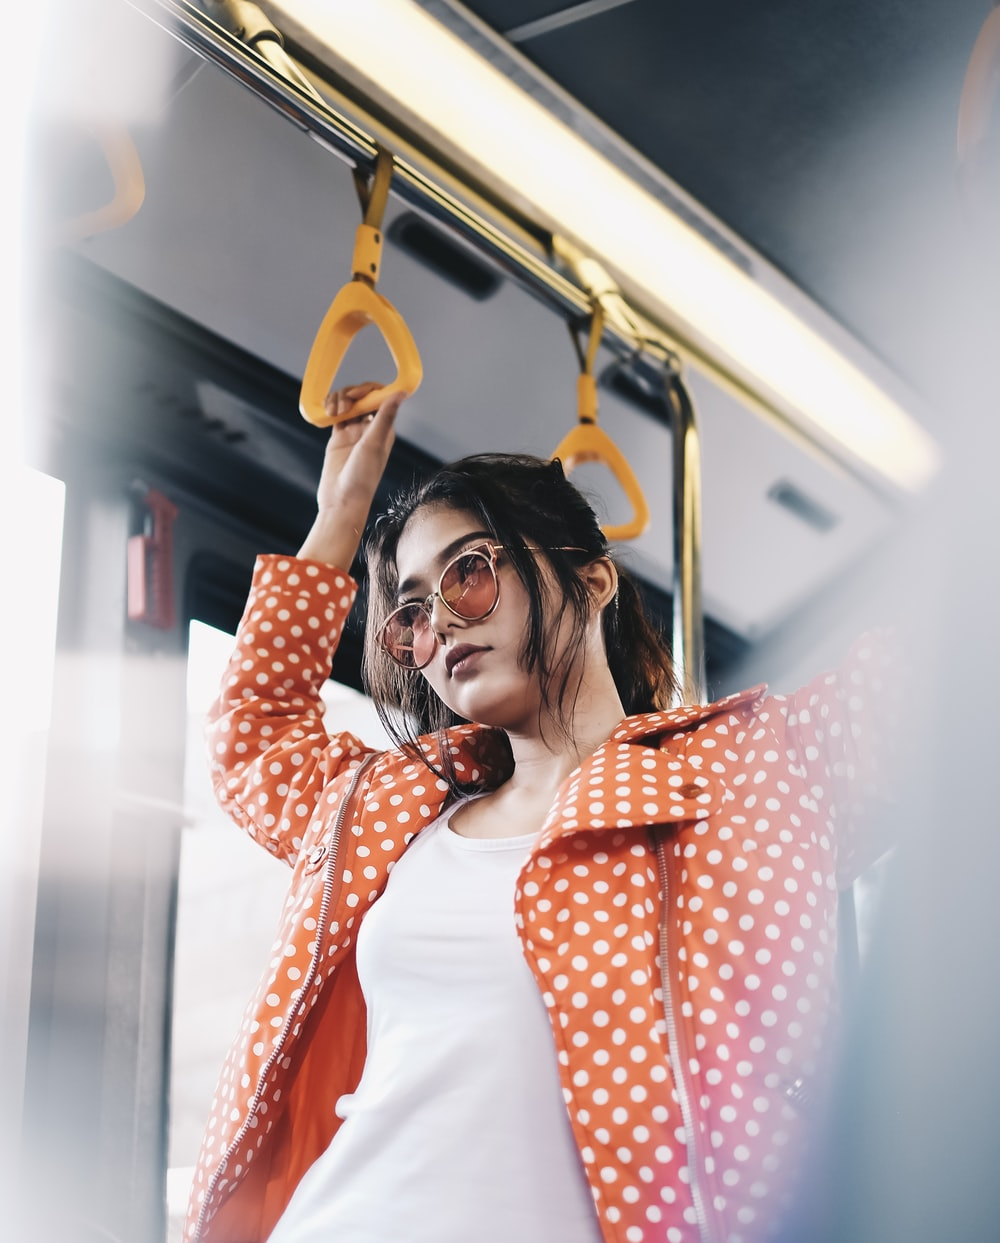 woman standing inside vehicle